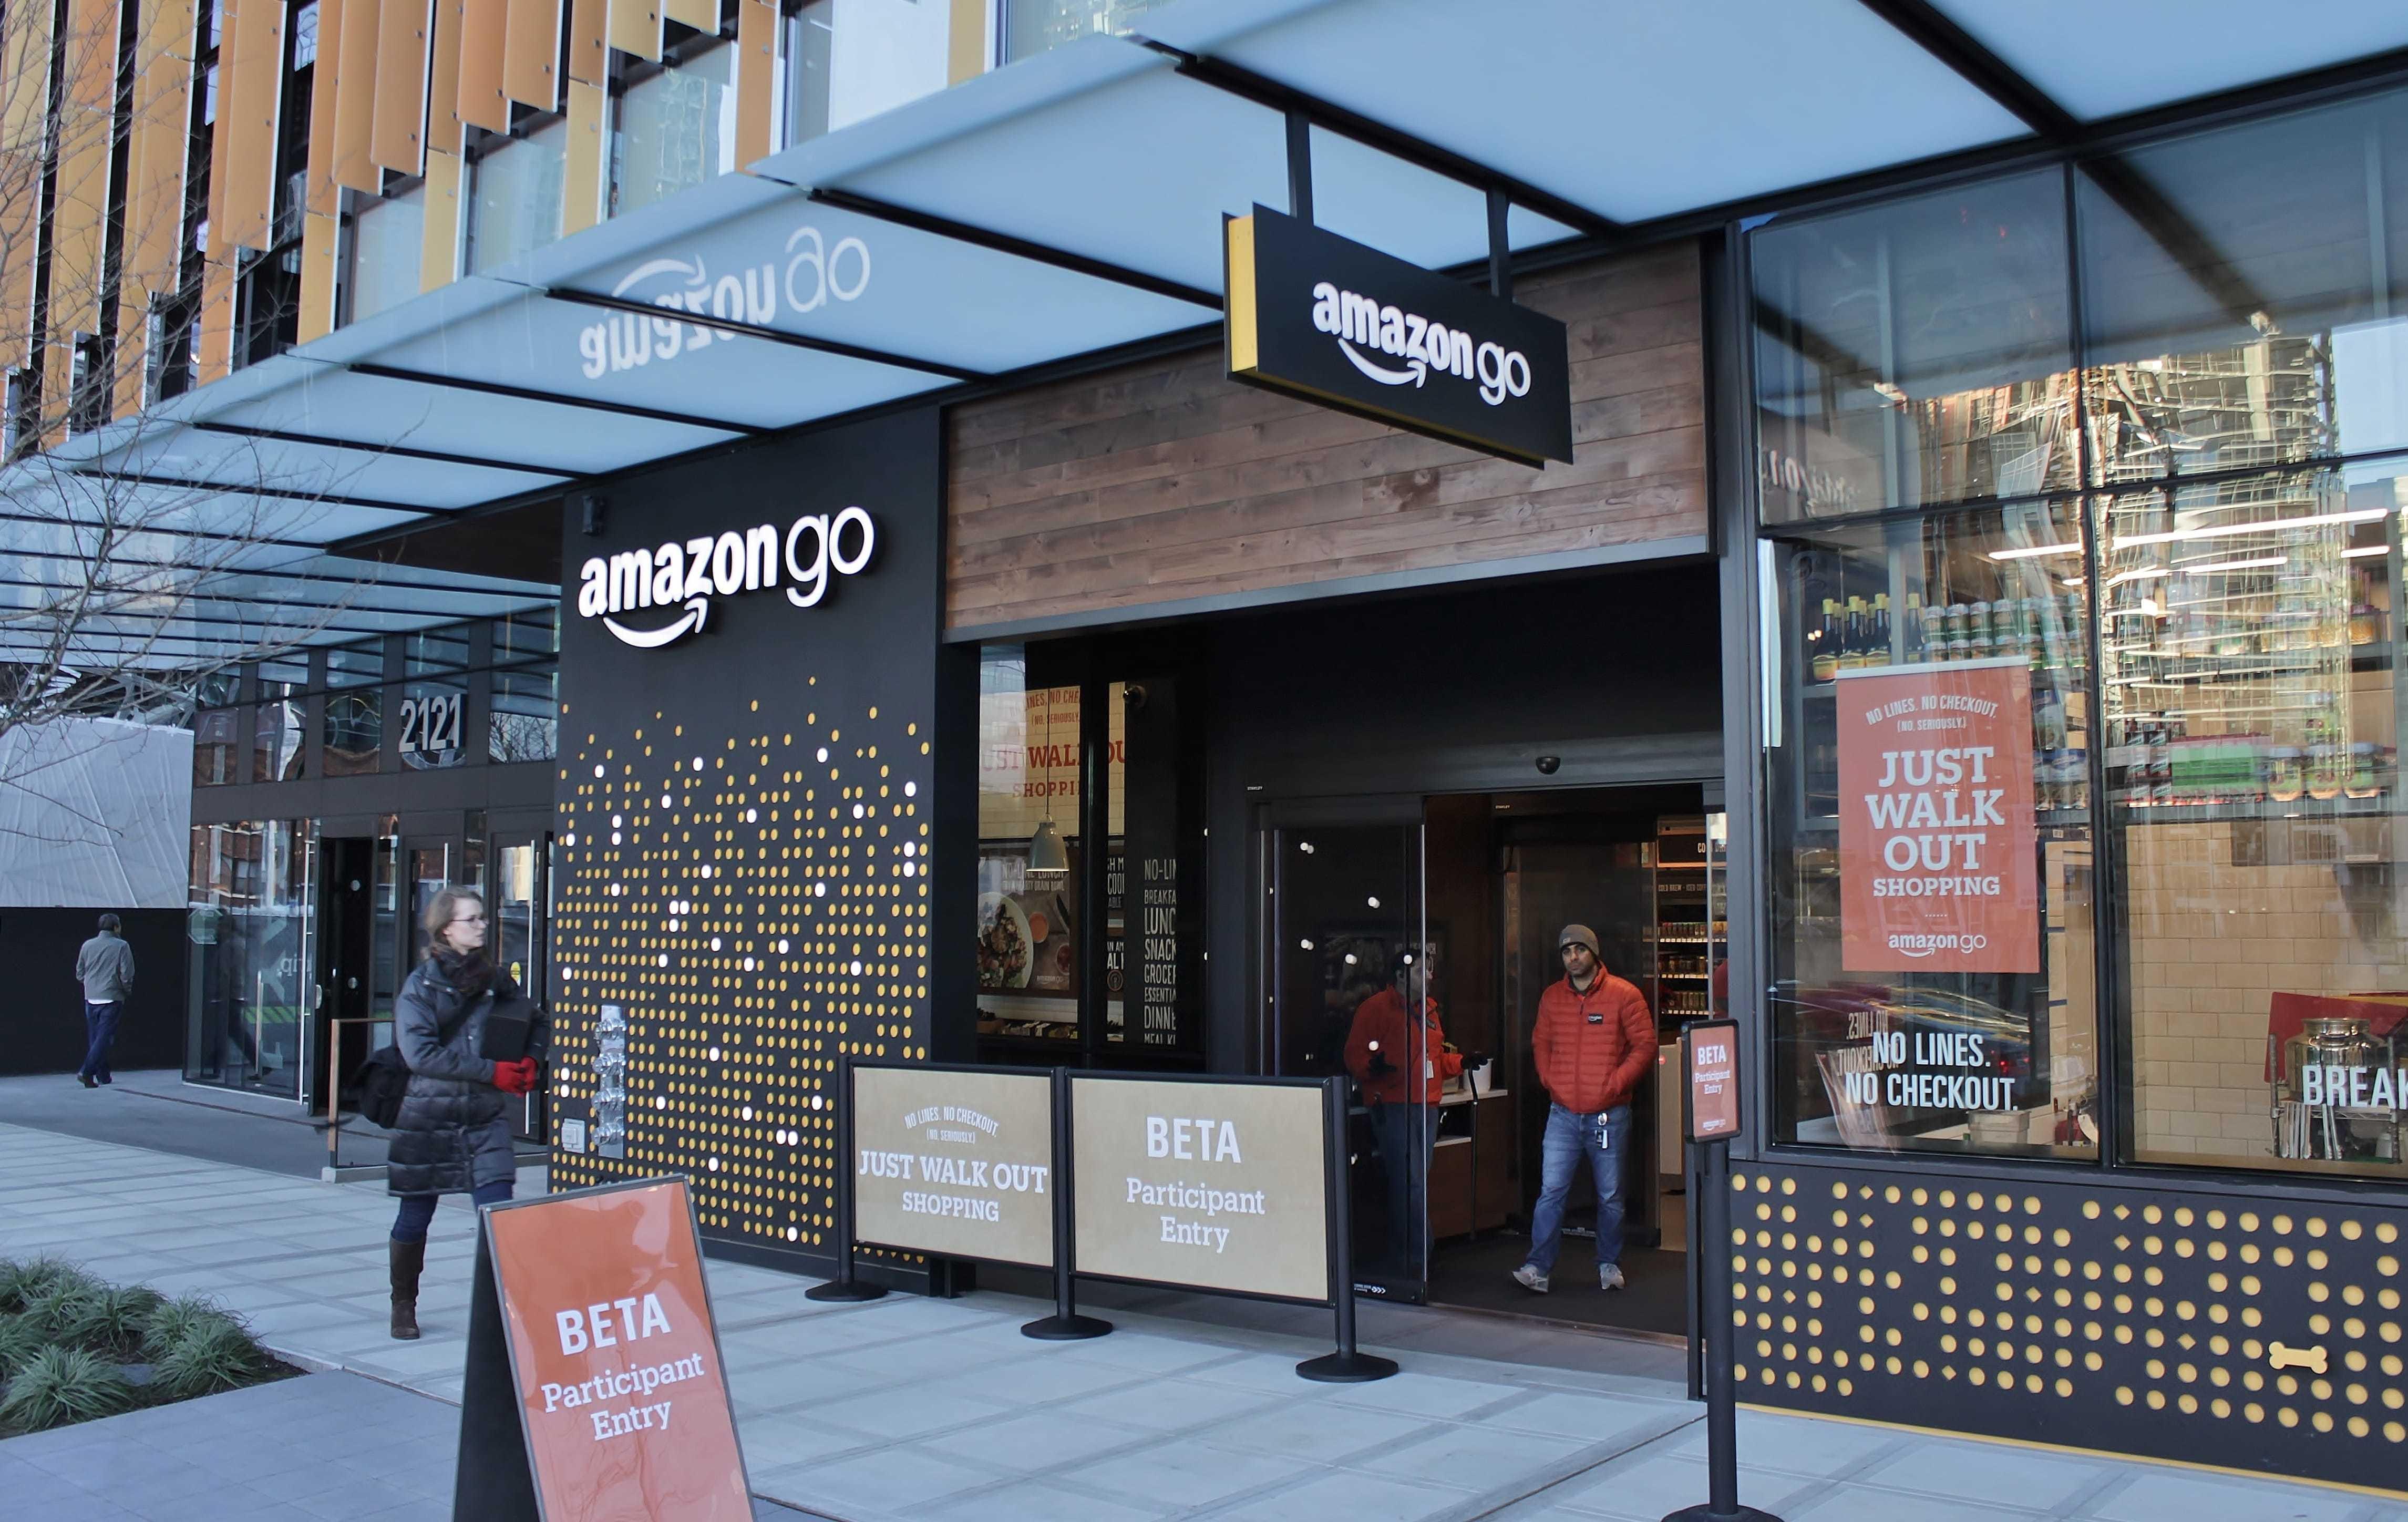 Amazon Go in Seattle